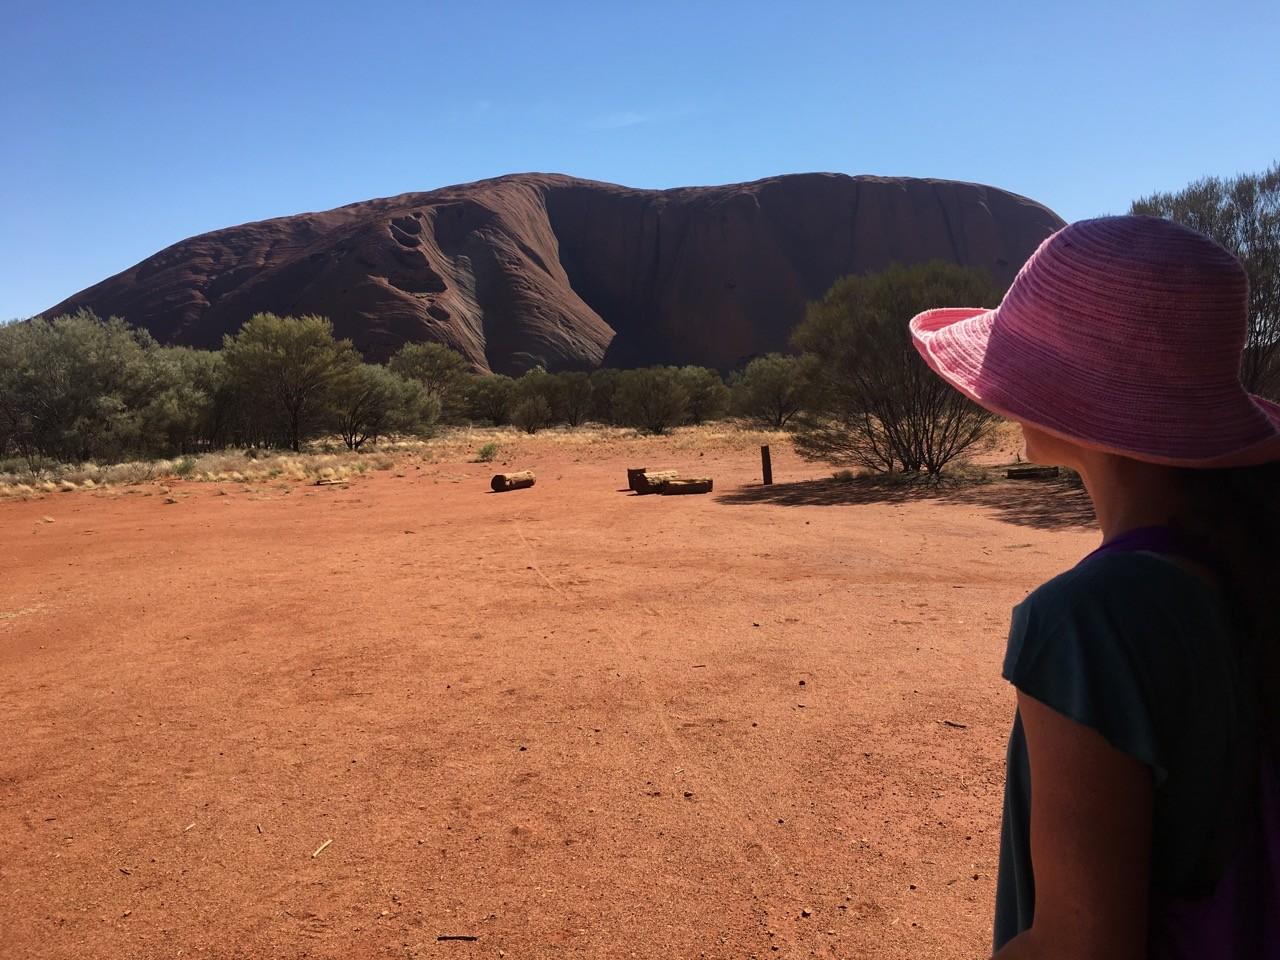 Uluru - Kata Tjuta National Park. Contributed by Emma from Small Footprint, Big Adventures